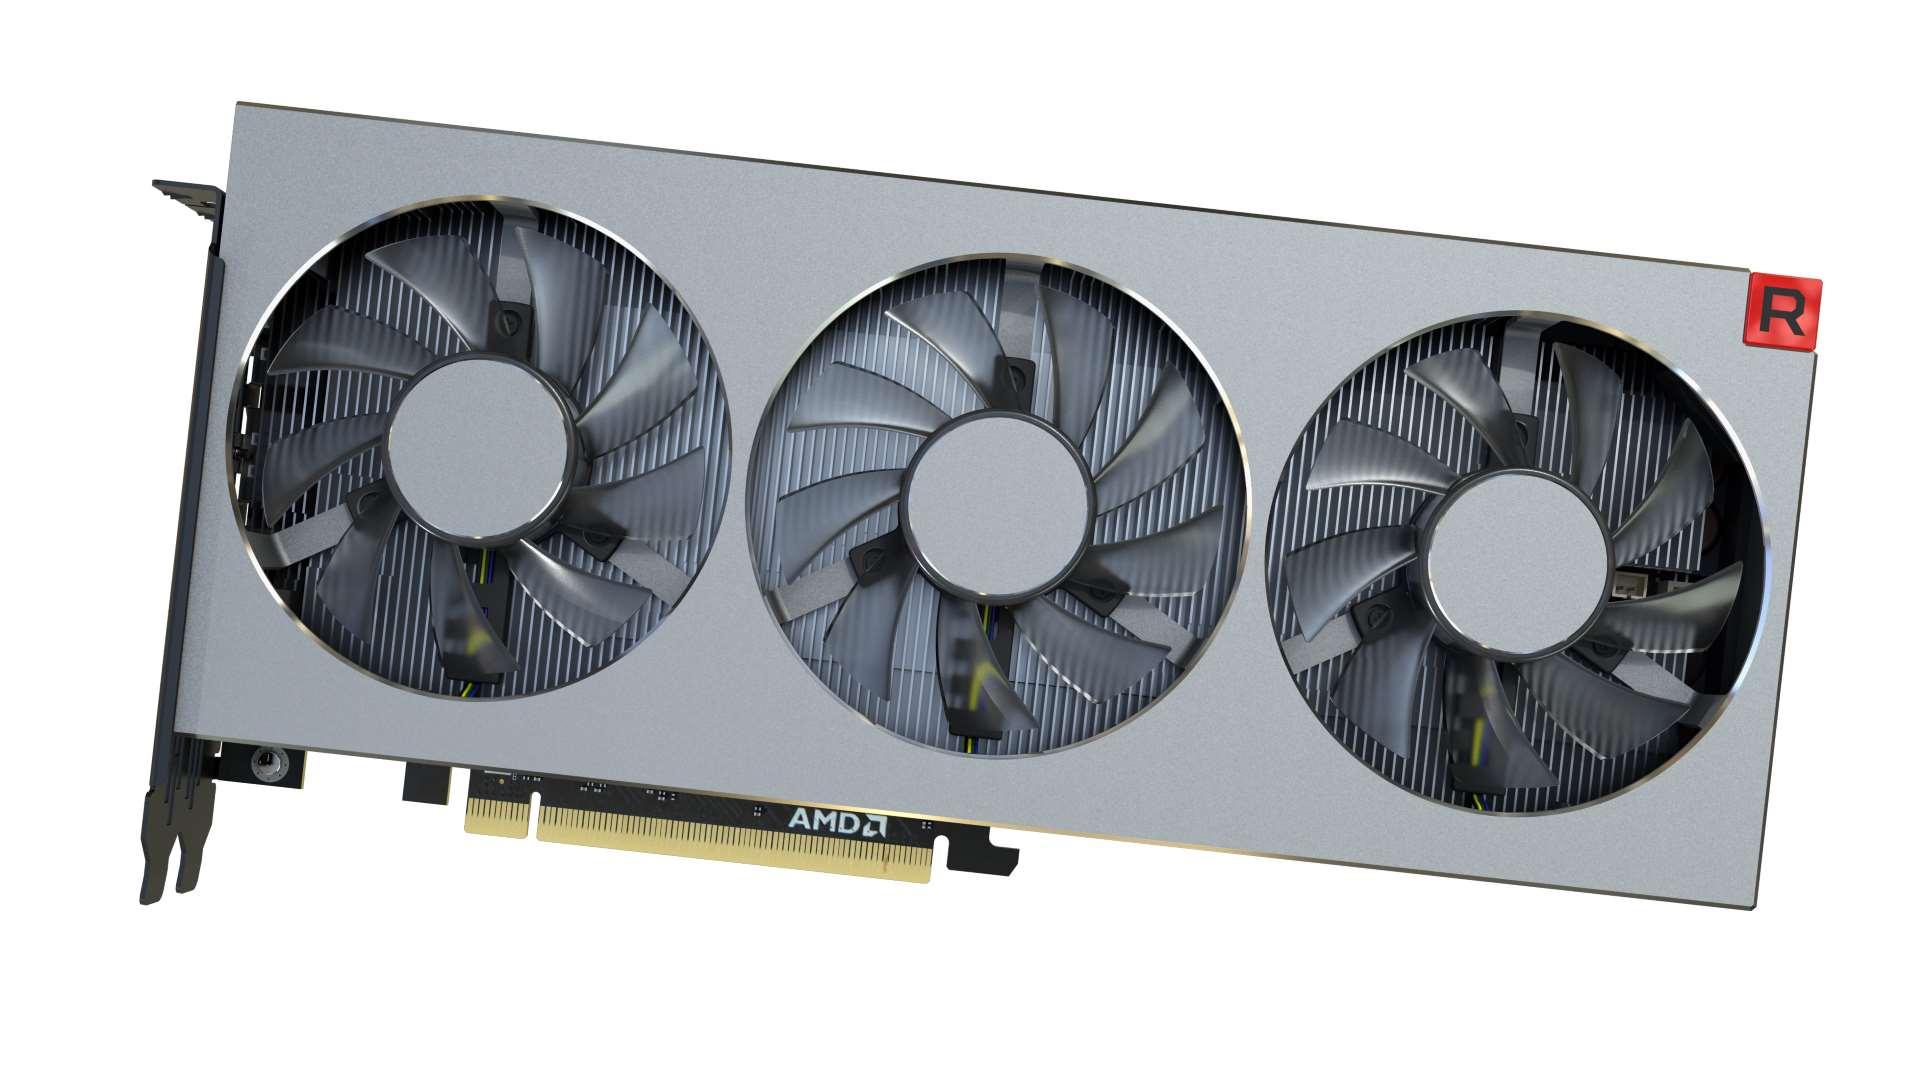 AMD Radeon VII review: a genuine high-end alternative to